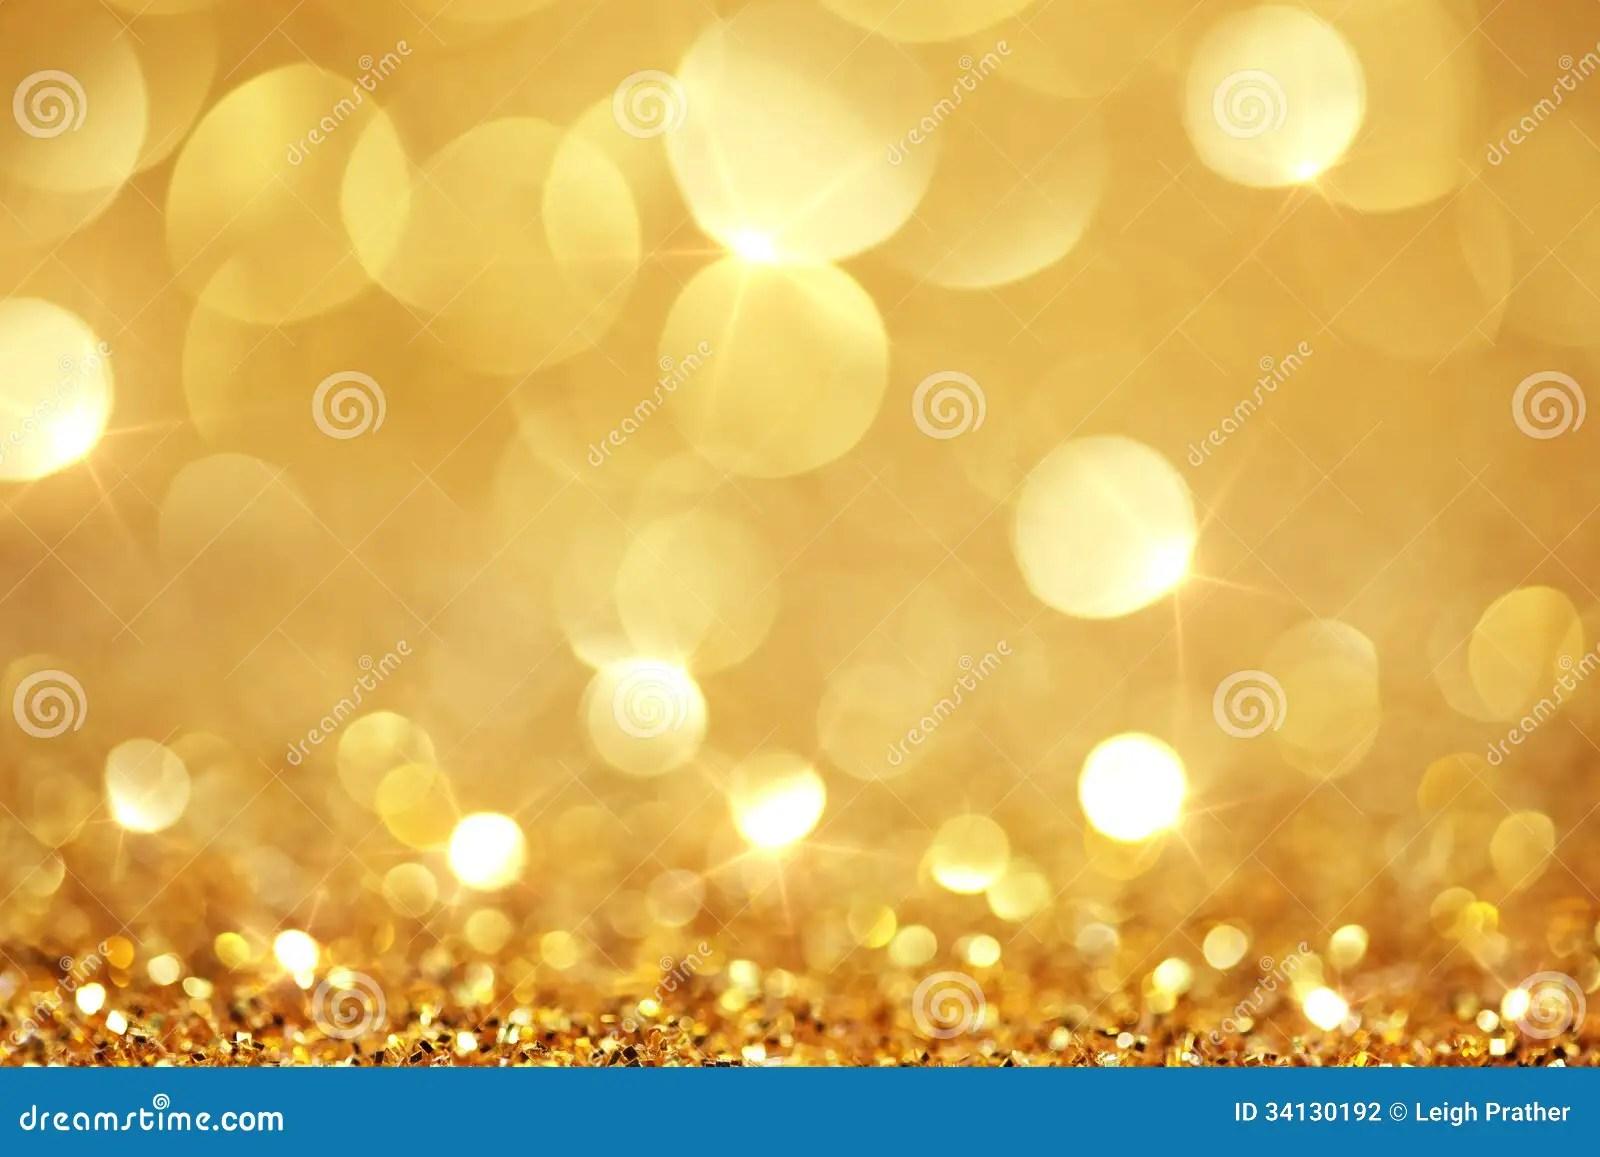 Shiny Golden Lights Stock Photography Image 34130192